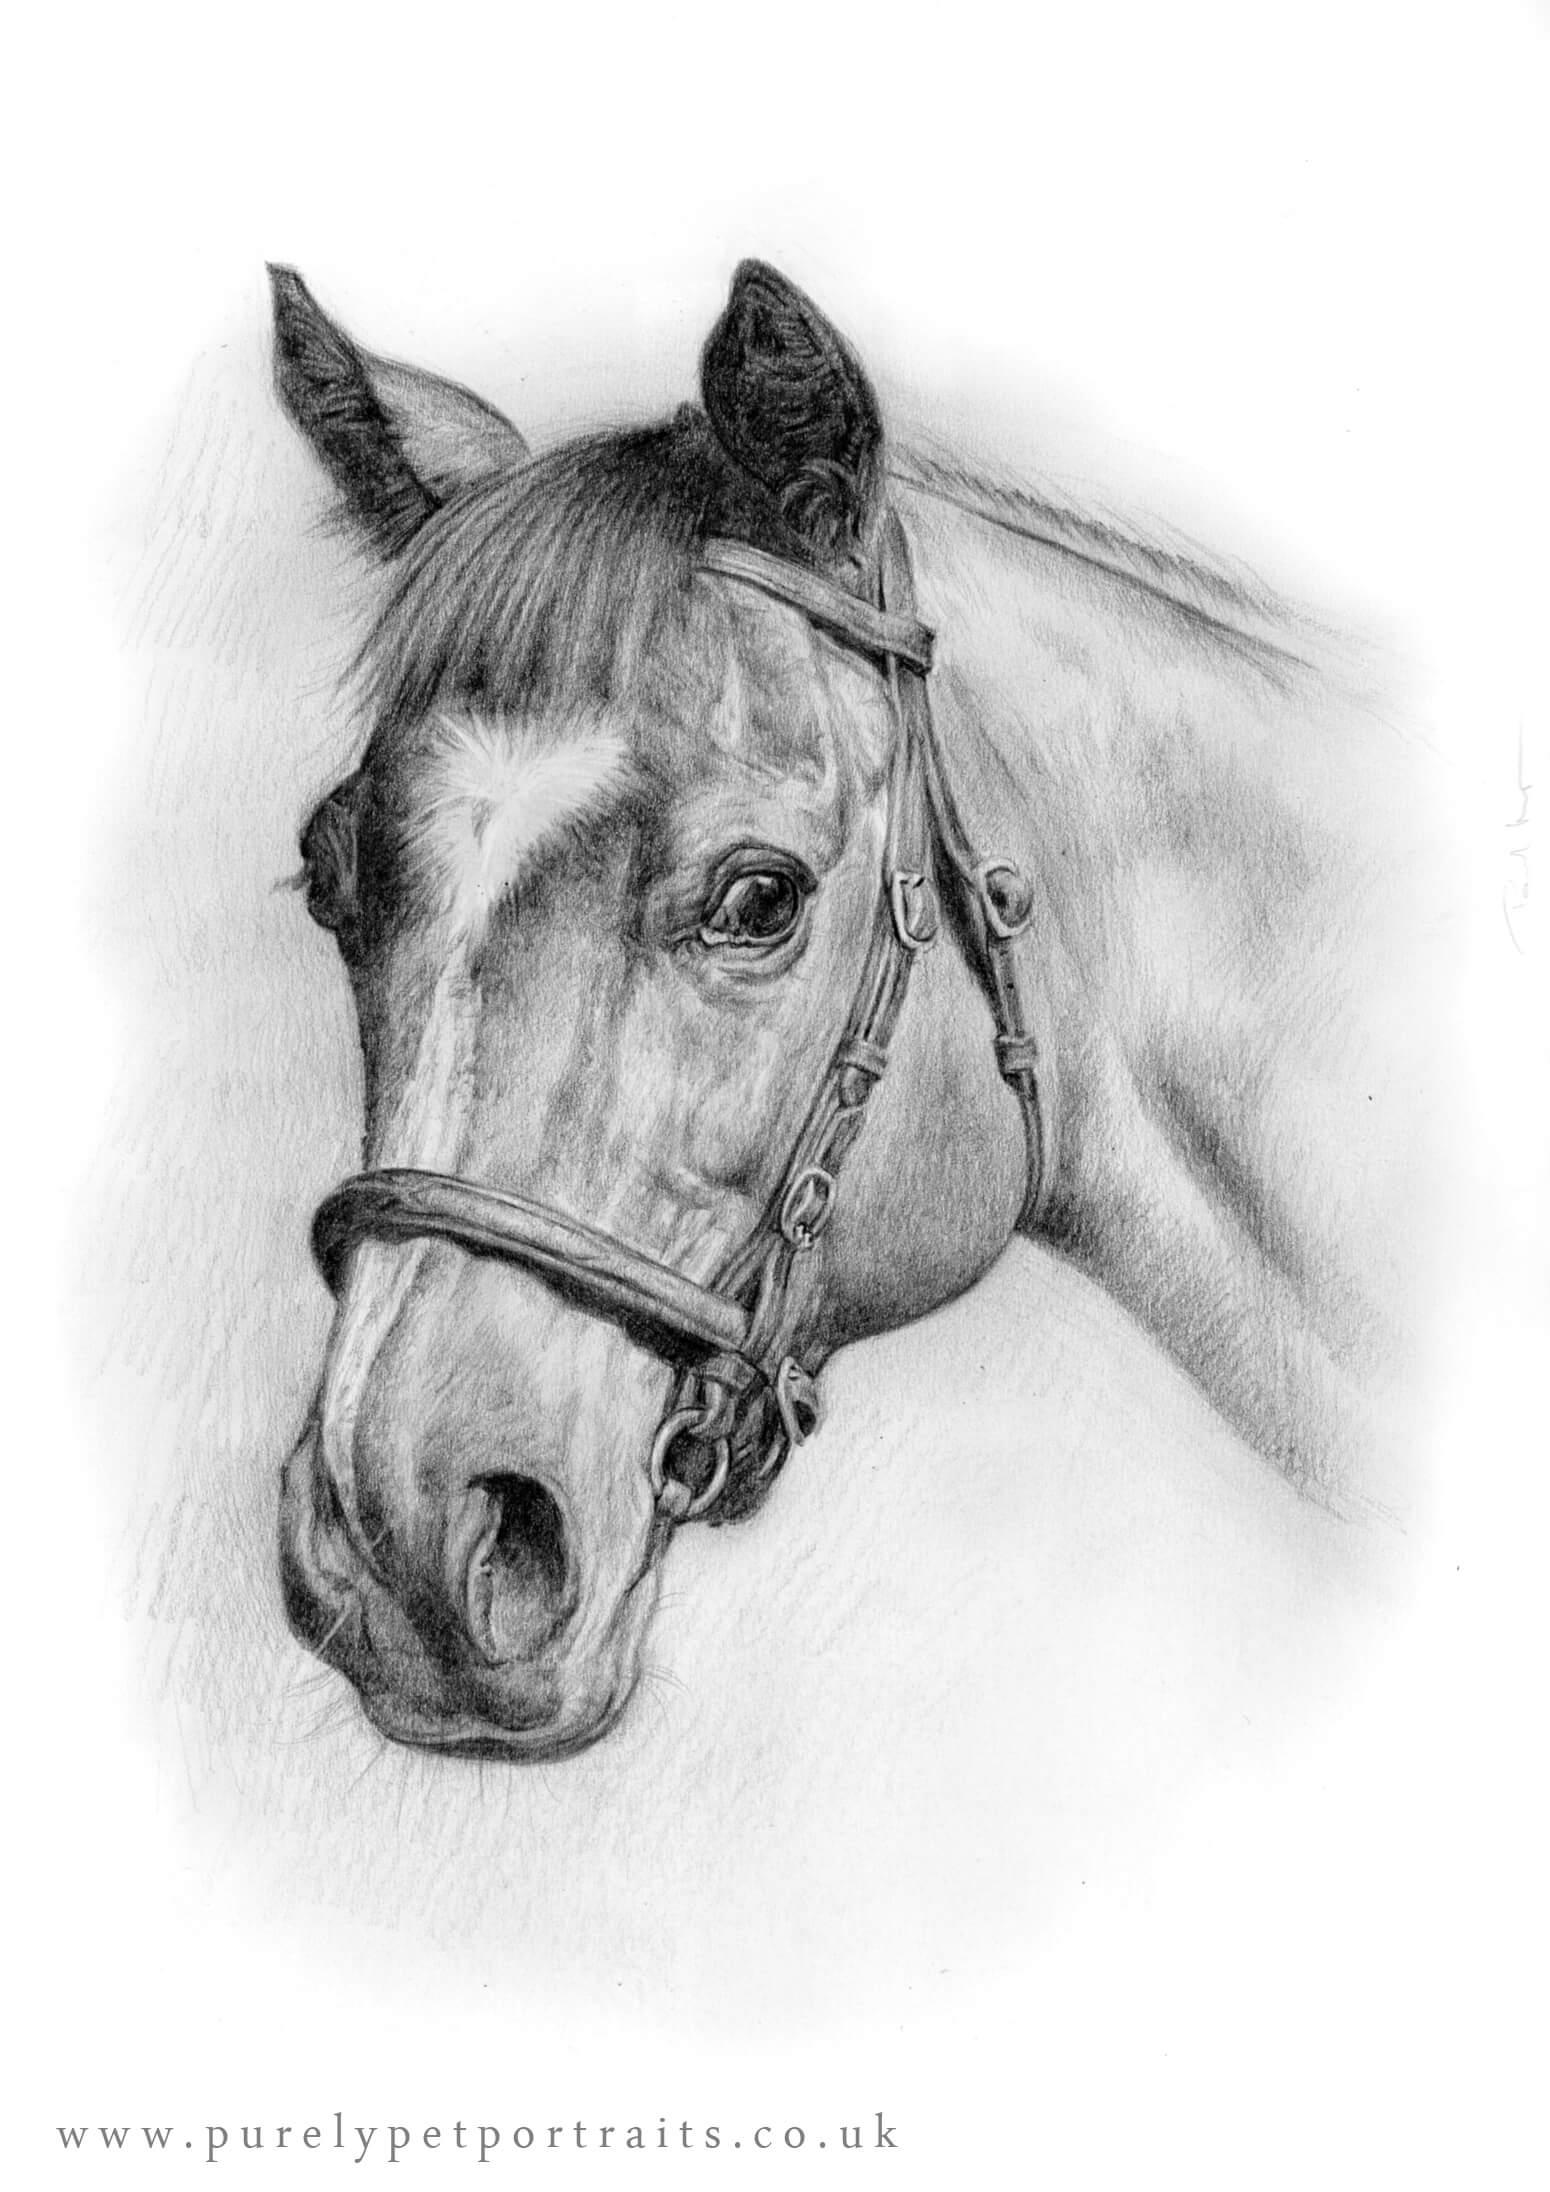 Horse portrait by Paul Moyse www.purelypetportraits.co.uk